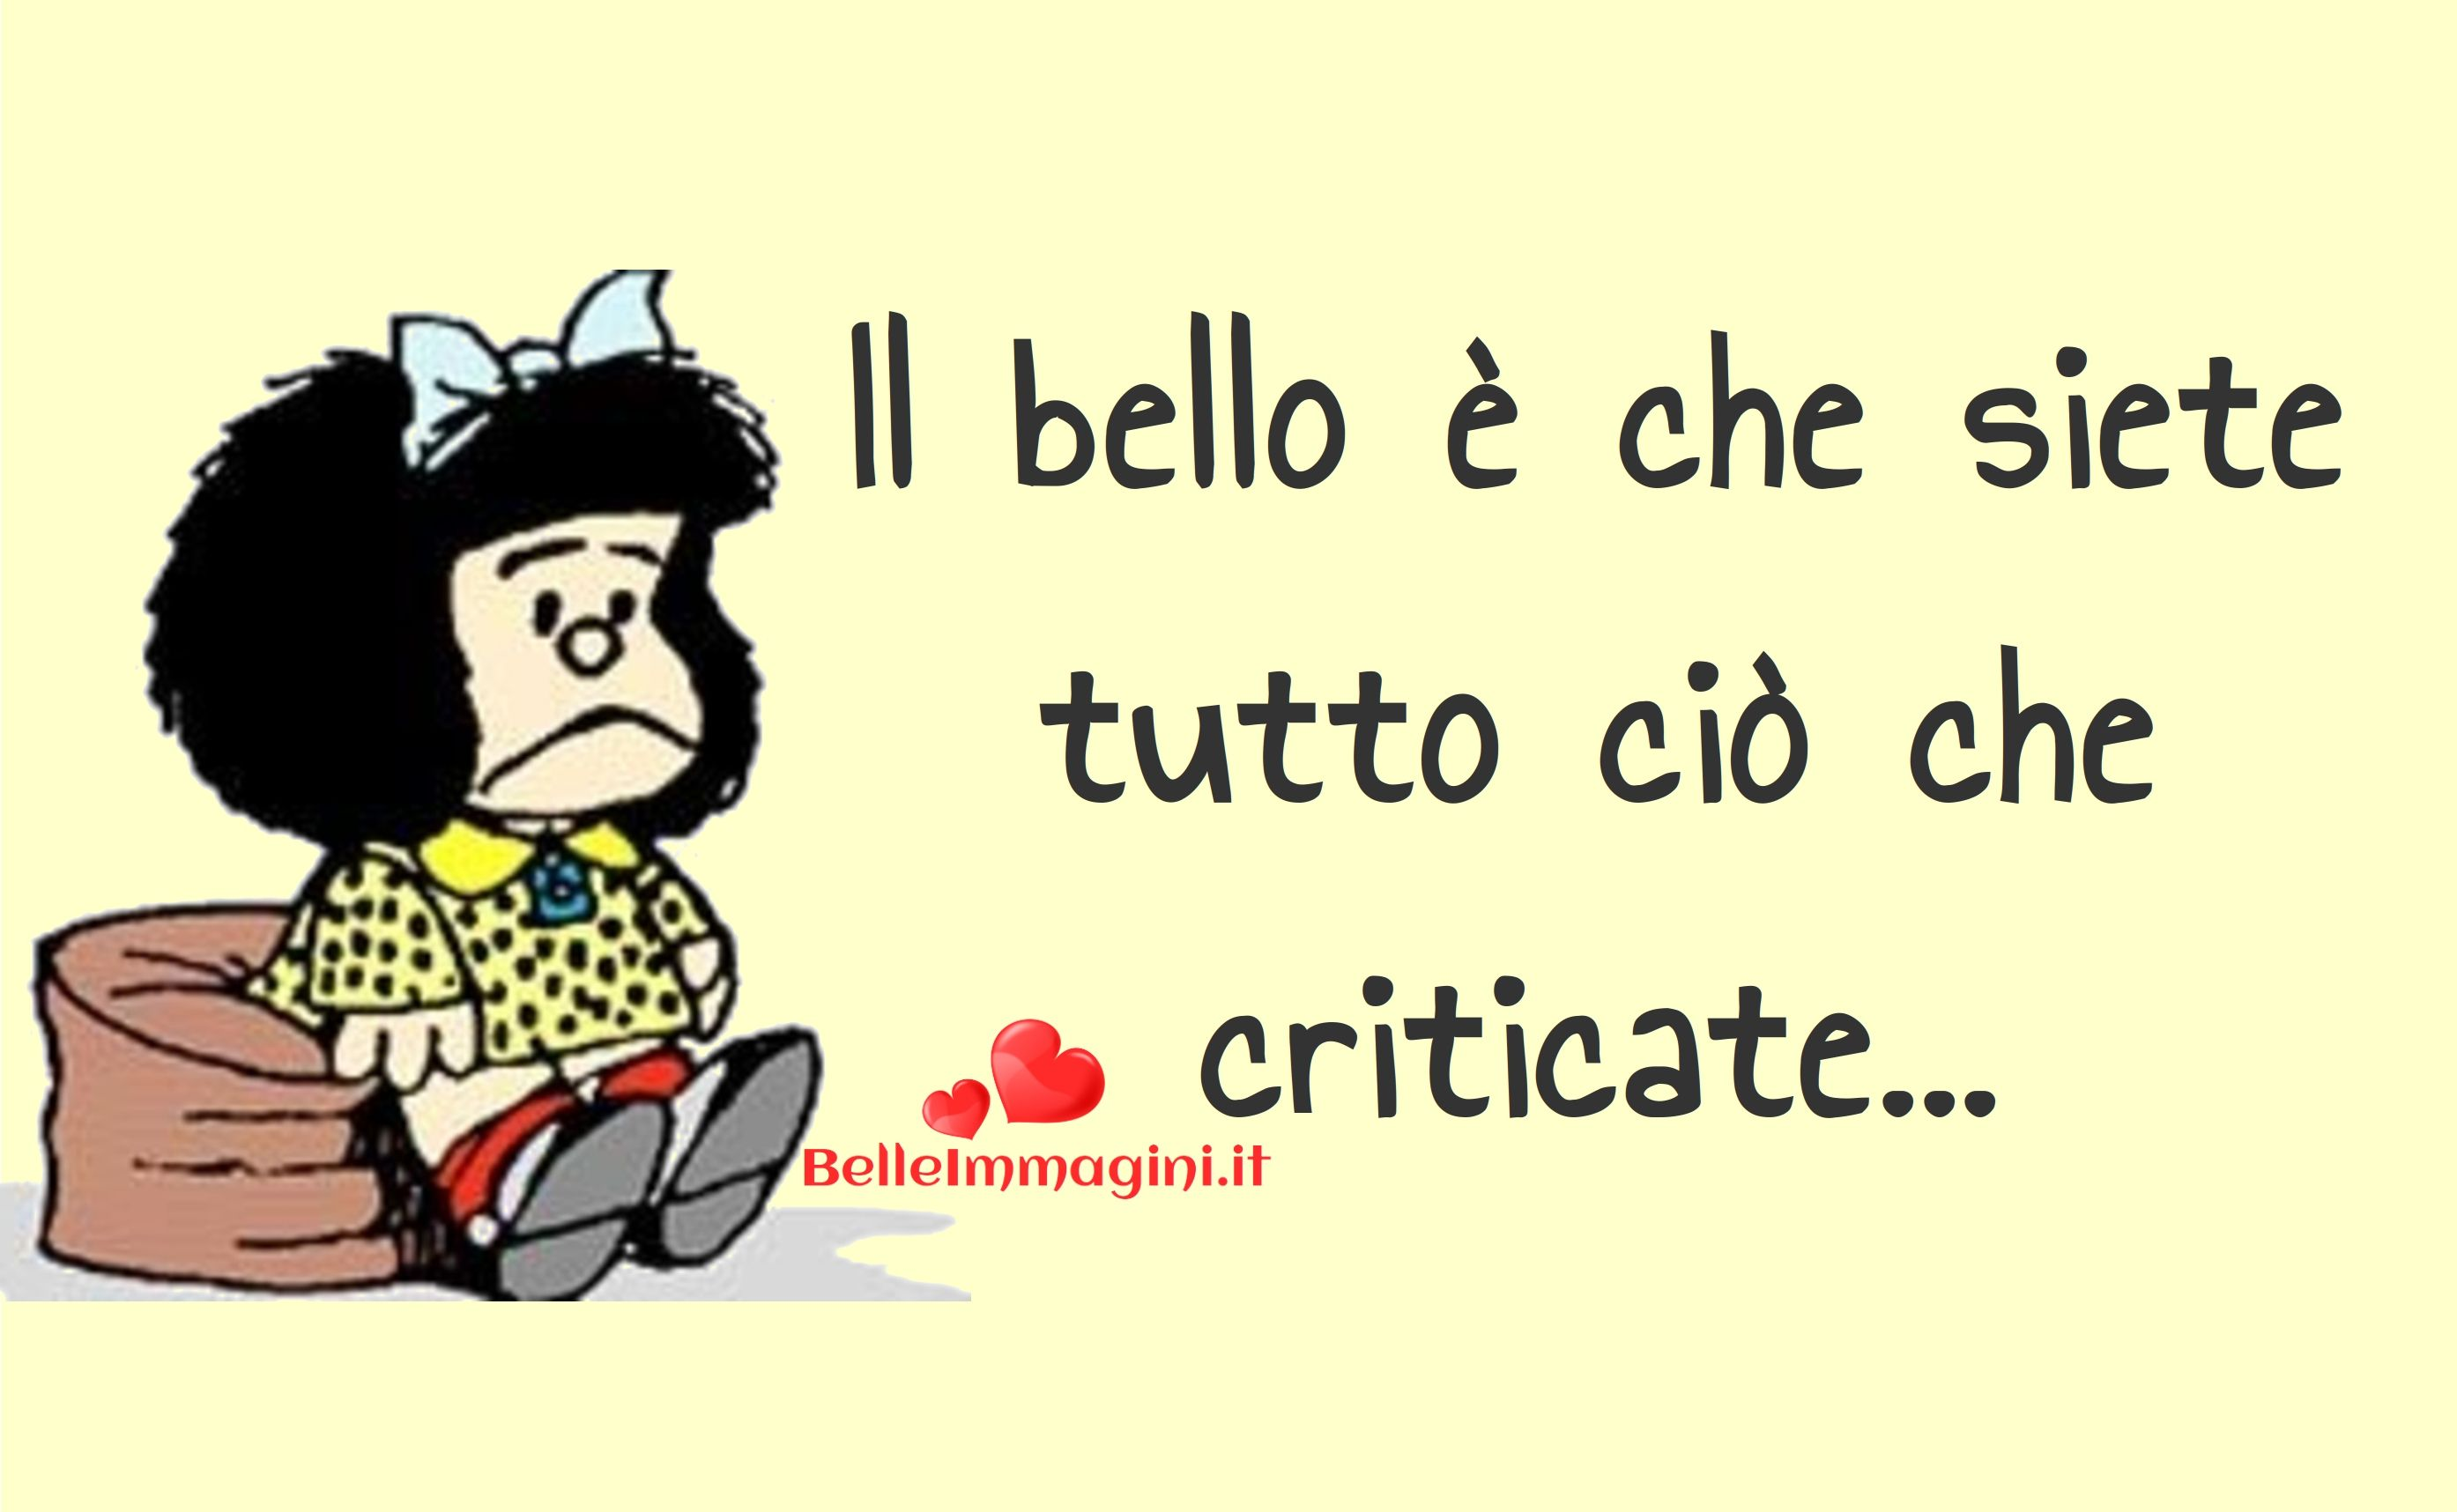 Frasi Belle Sulla Vita Spiritose.Belle Frasi Sulla Vita Mafalda Per Whatsapp Citazioni Citazioni